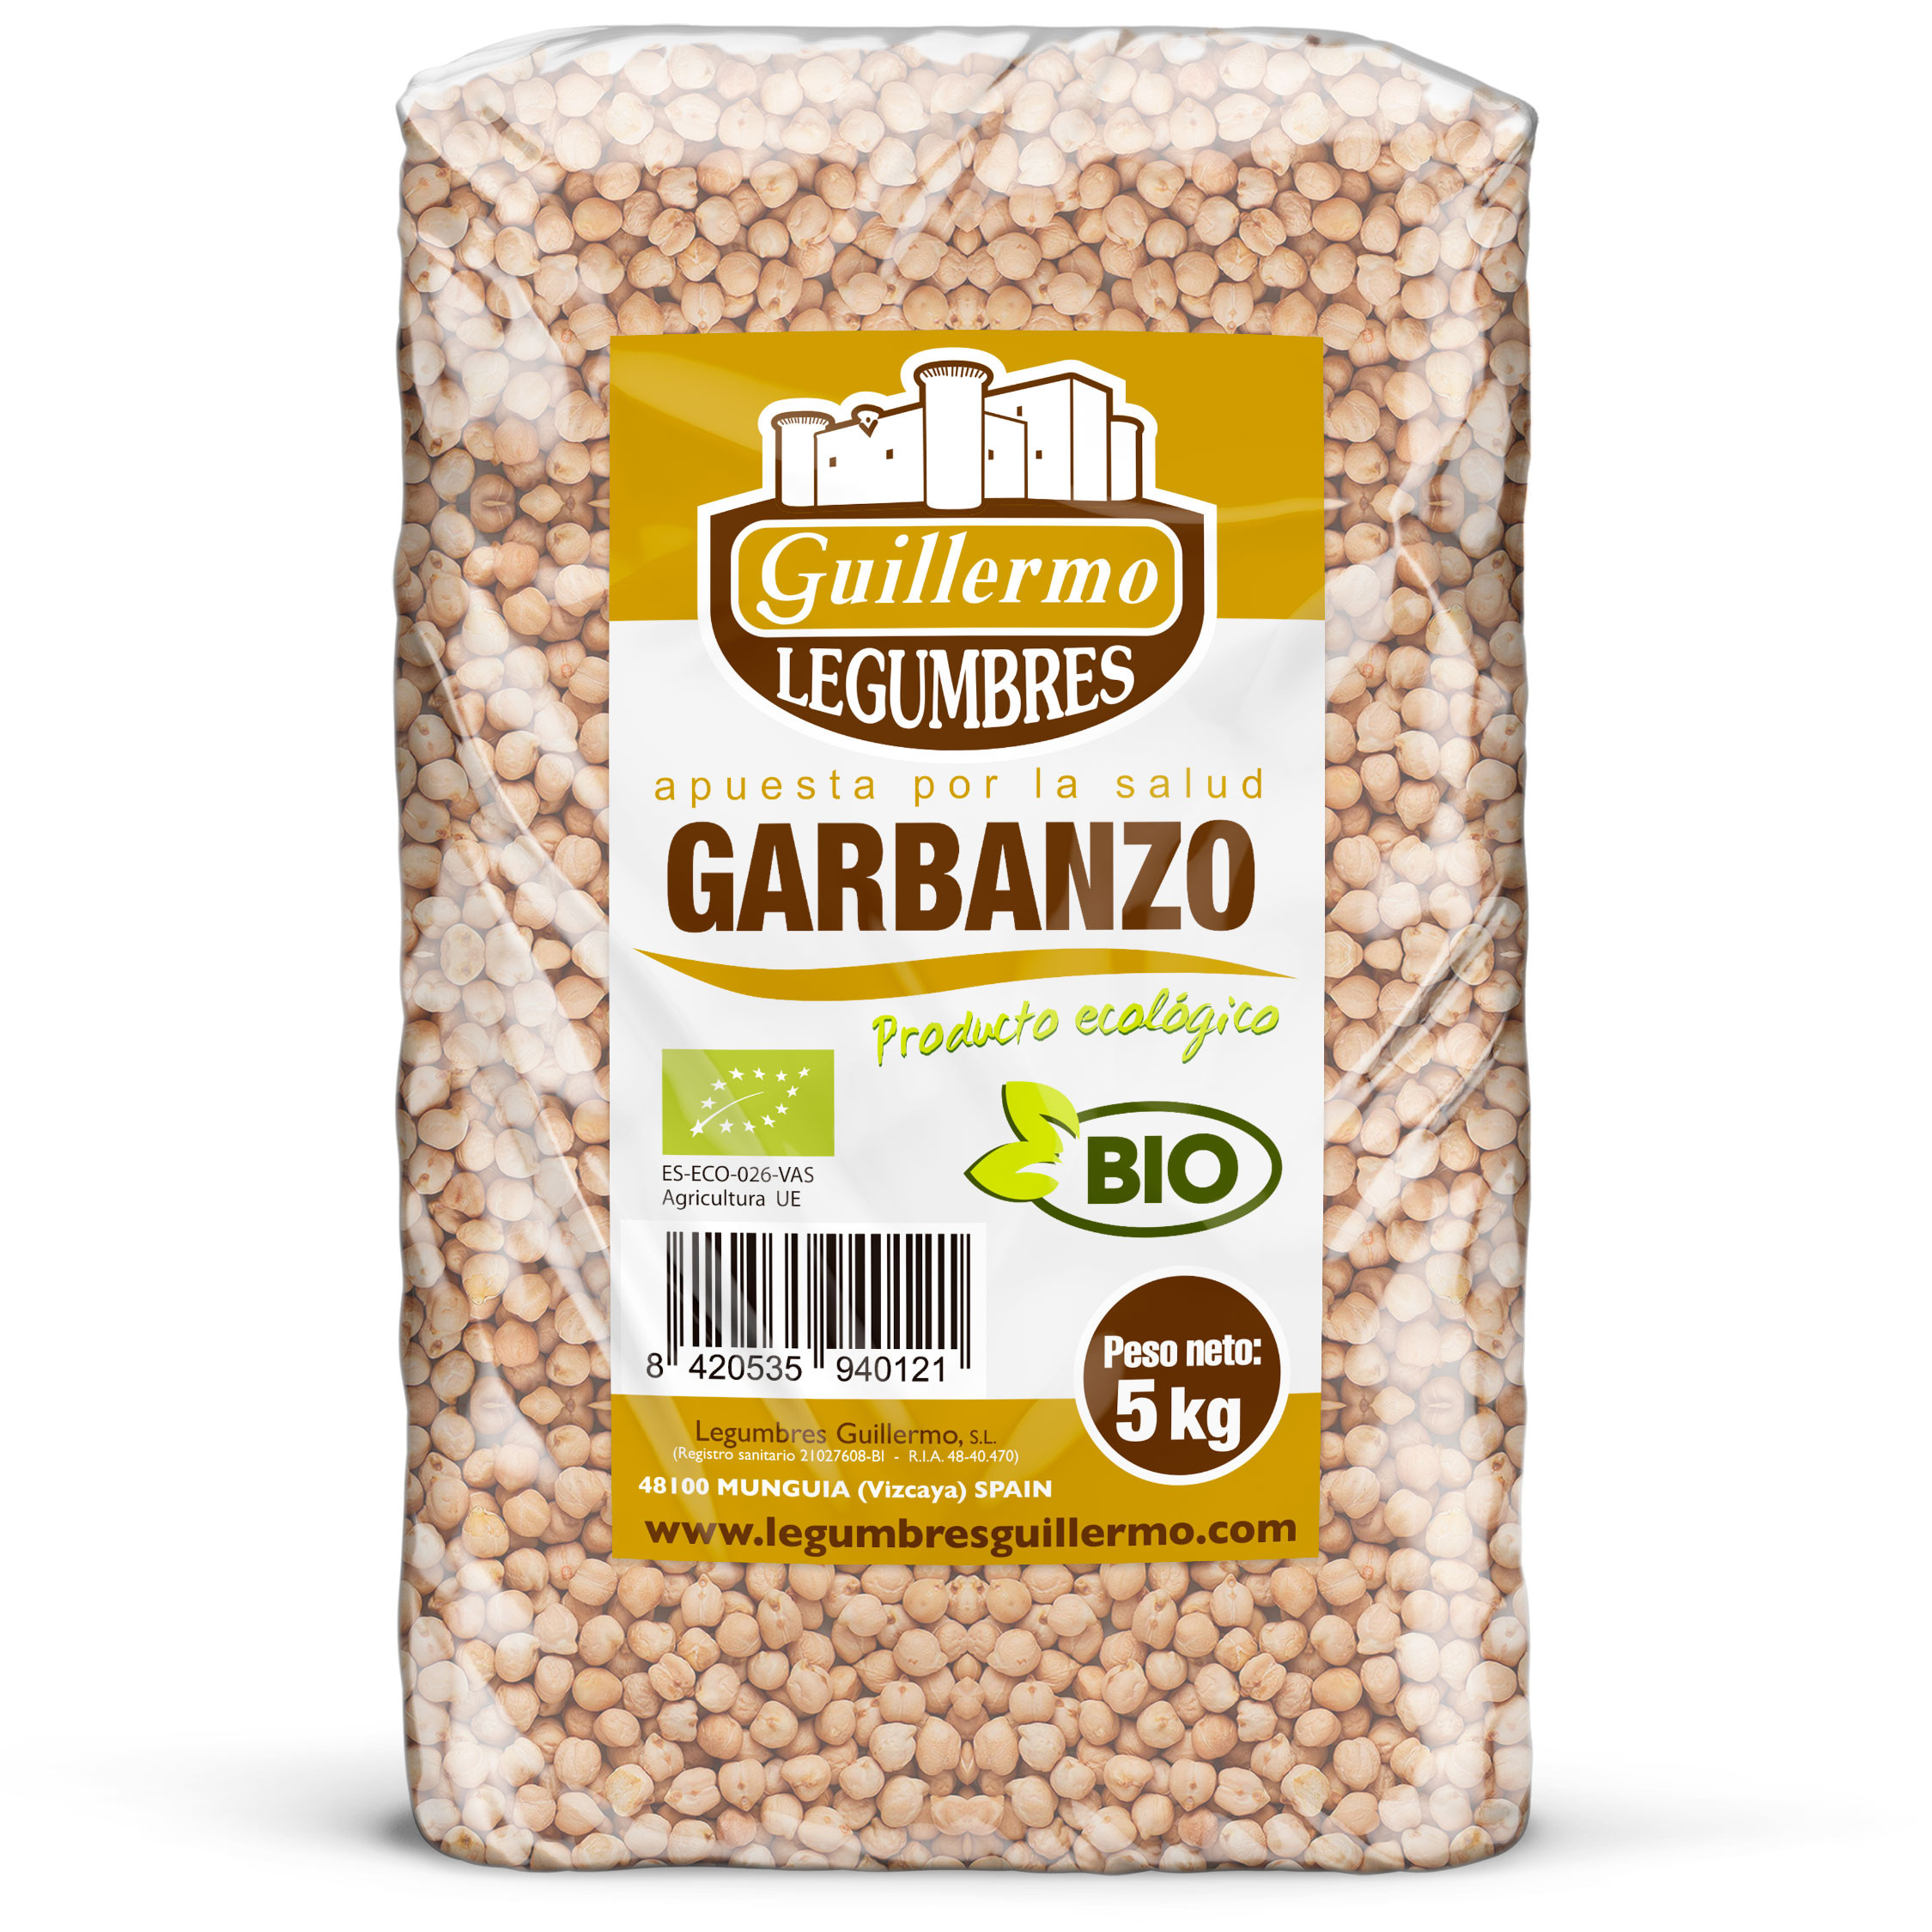 Guillermo Horeca Garbanzo Gordo Ecológico BIO Granel Calidad Extra 5kg